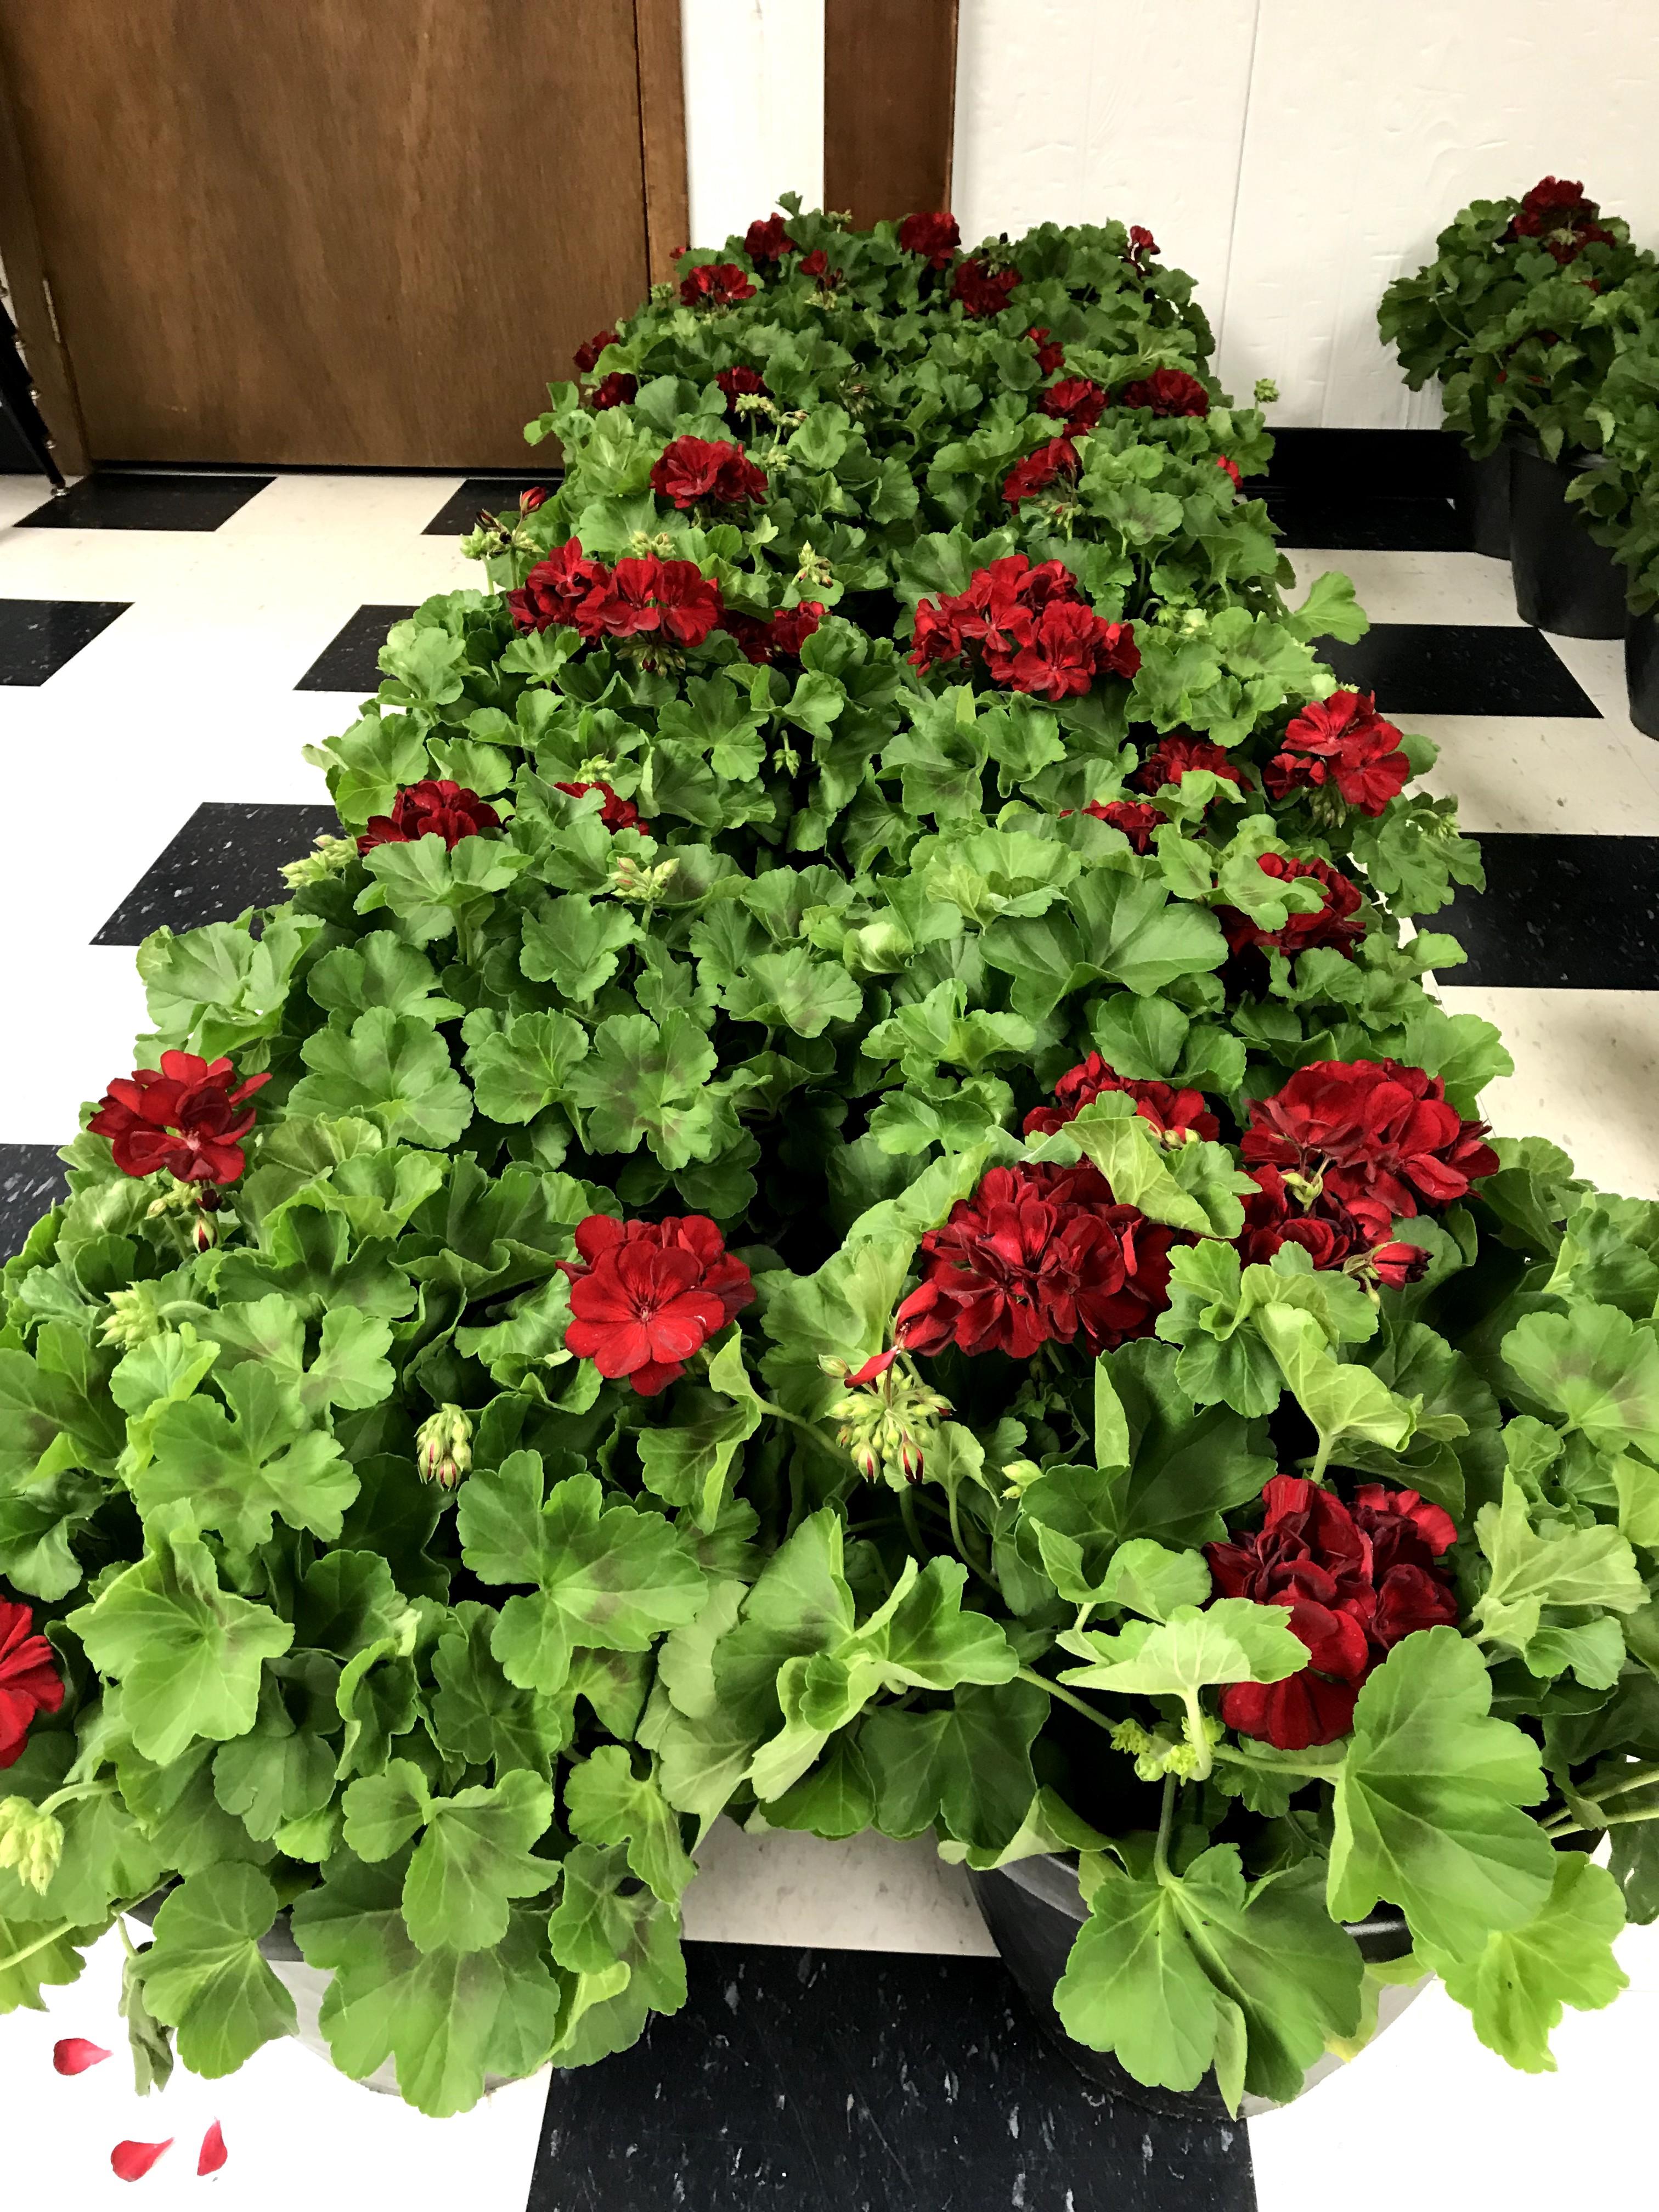 All Flower pots